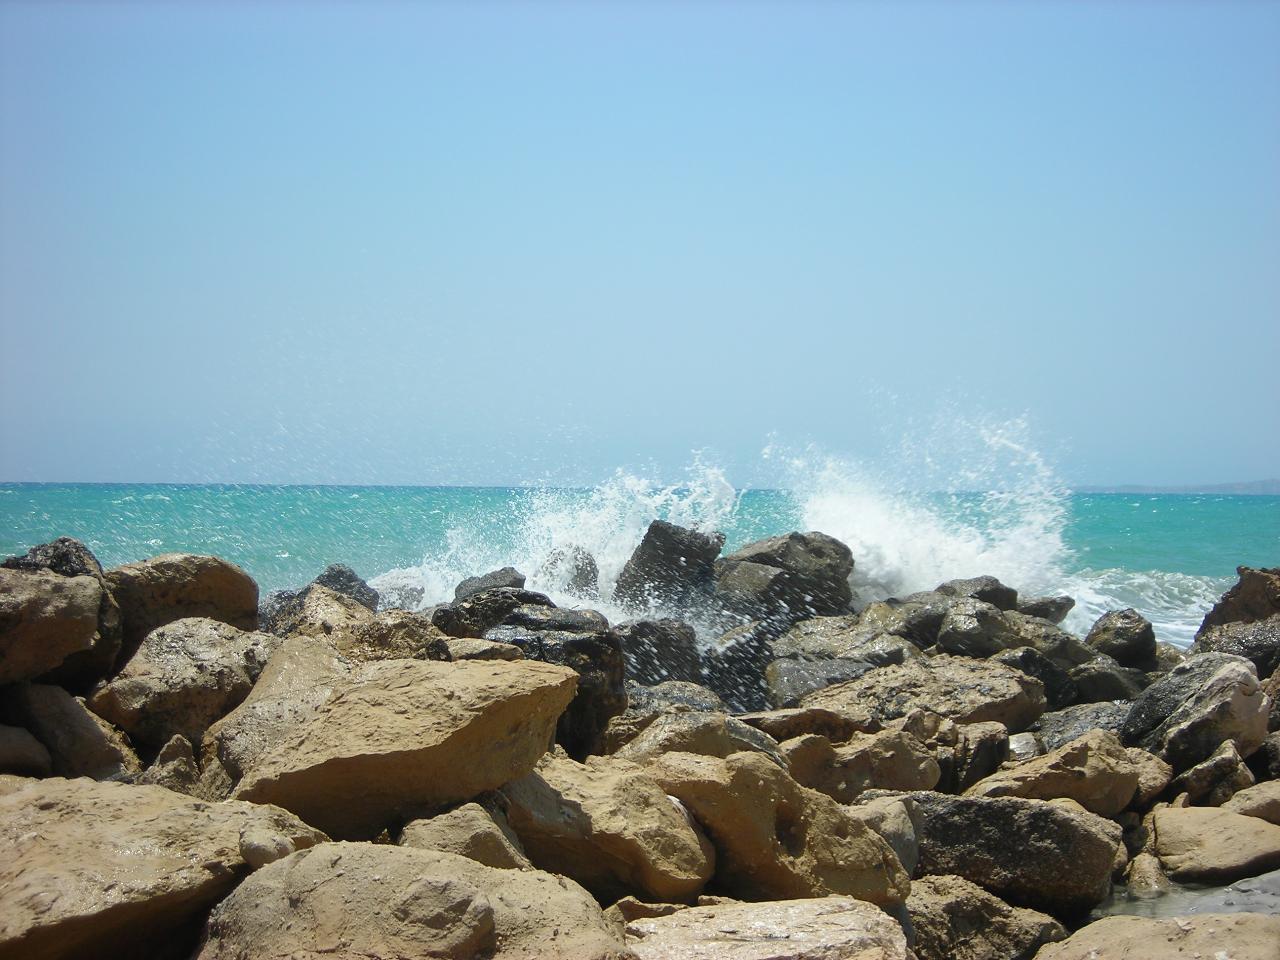 Playa Cala del Barranco de Aguas